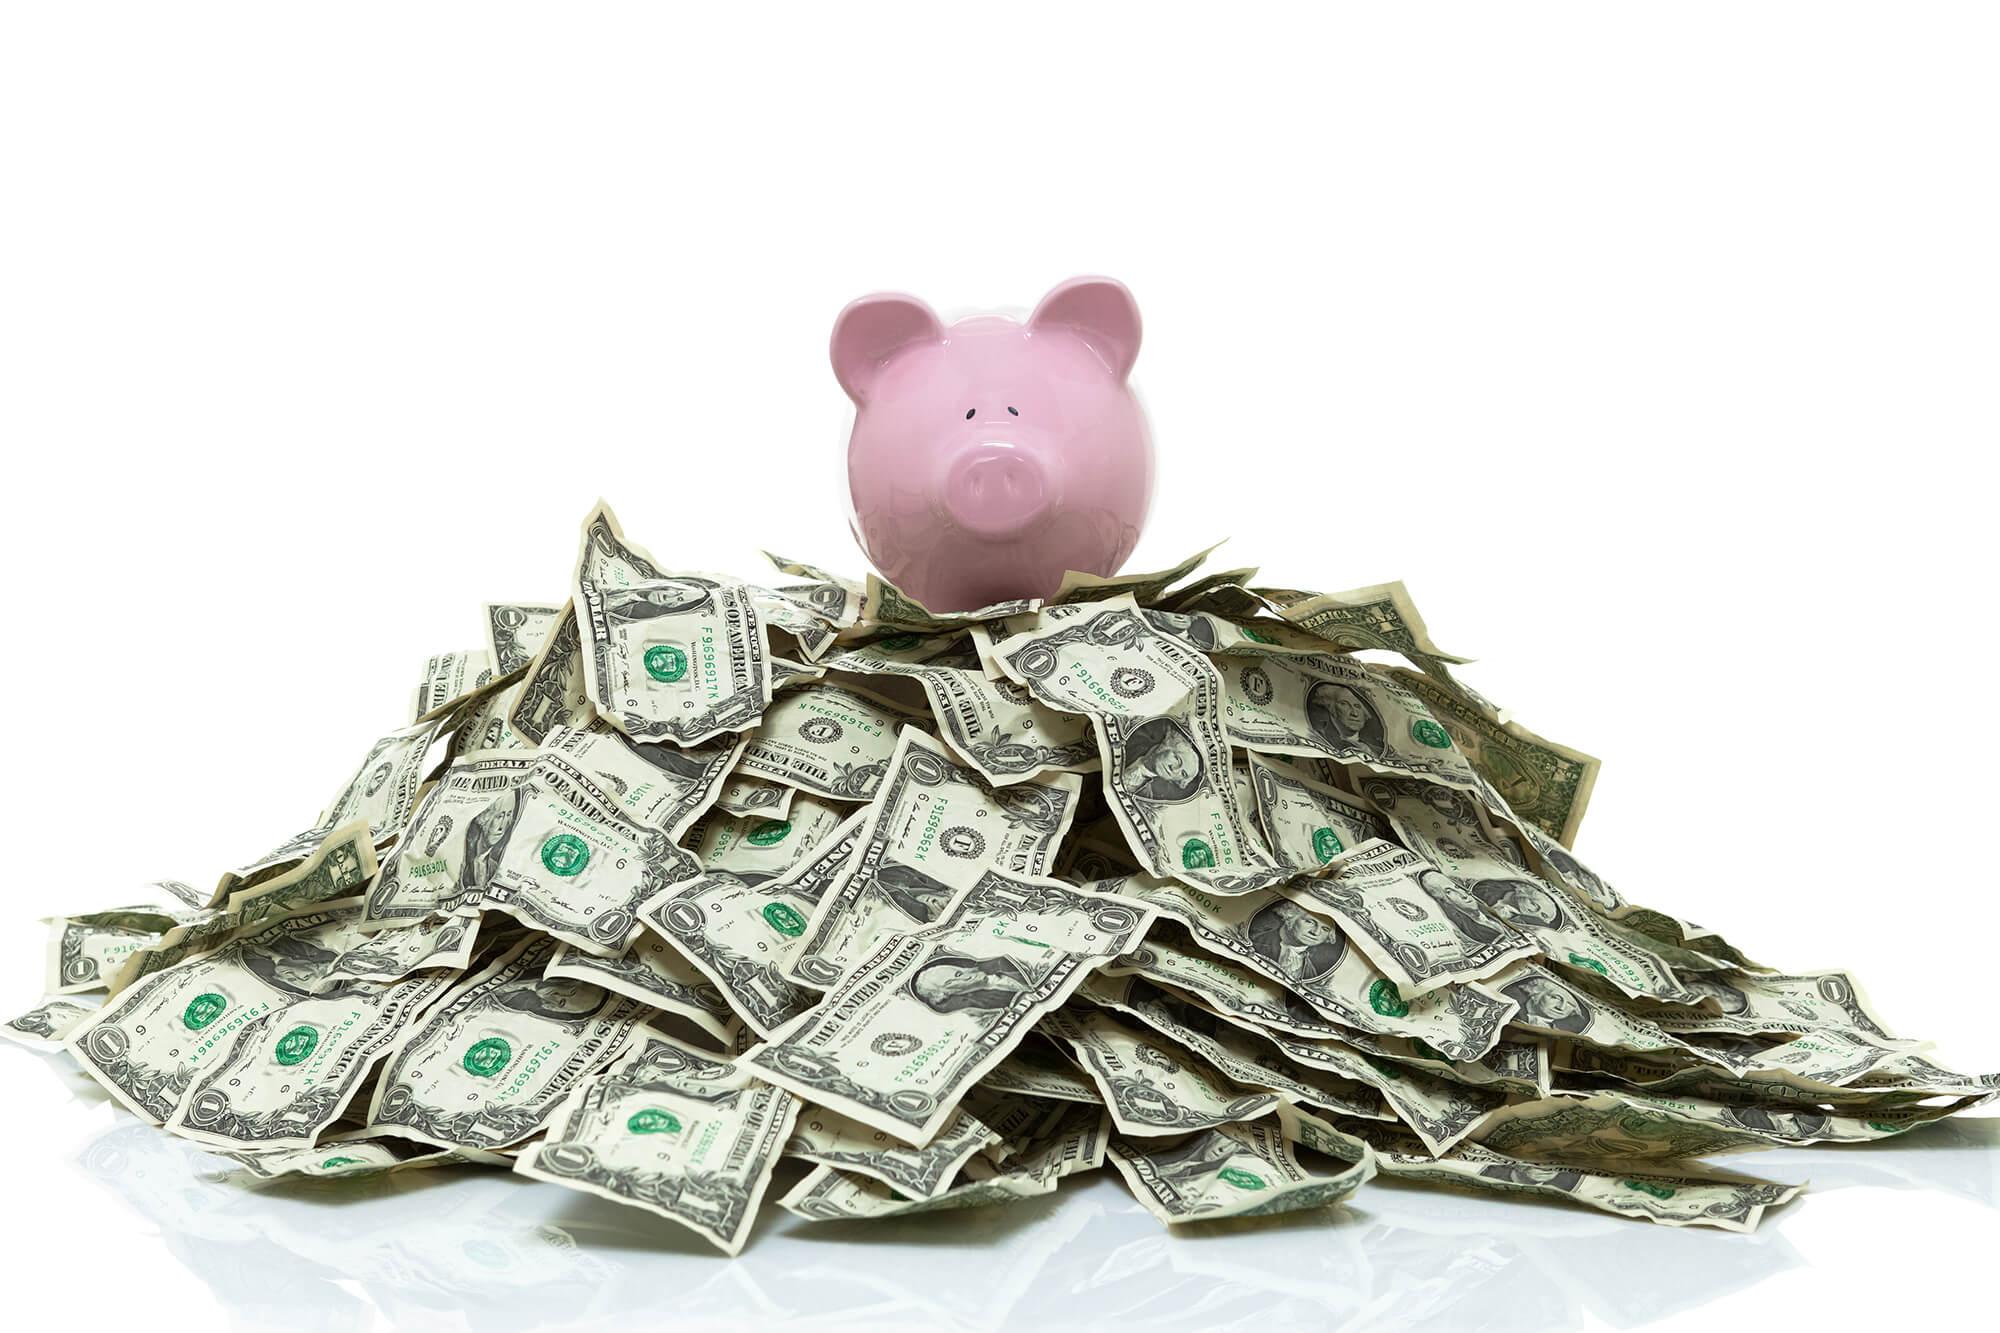 Photo of piggy bank with dollar bills surrounding it.